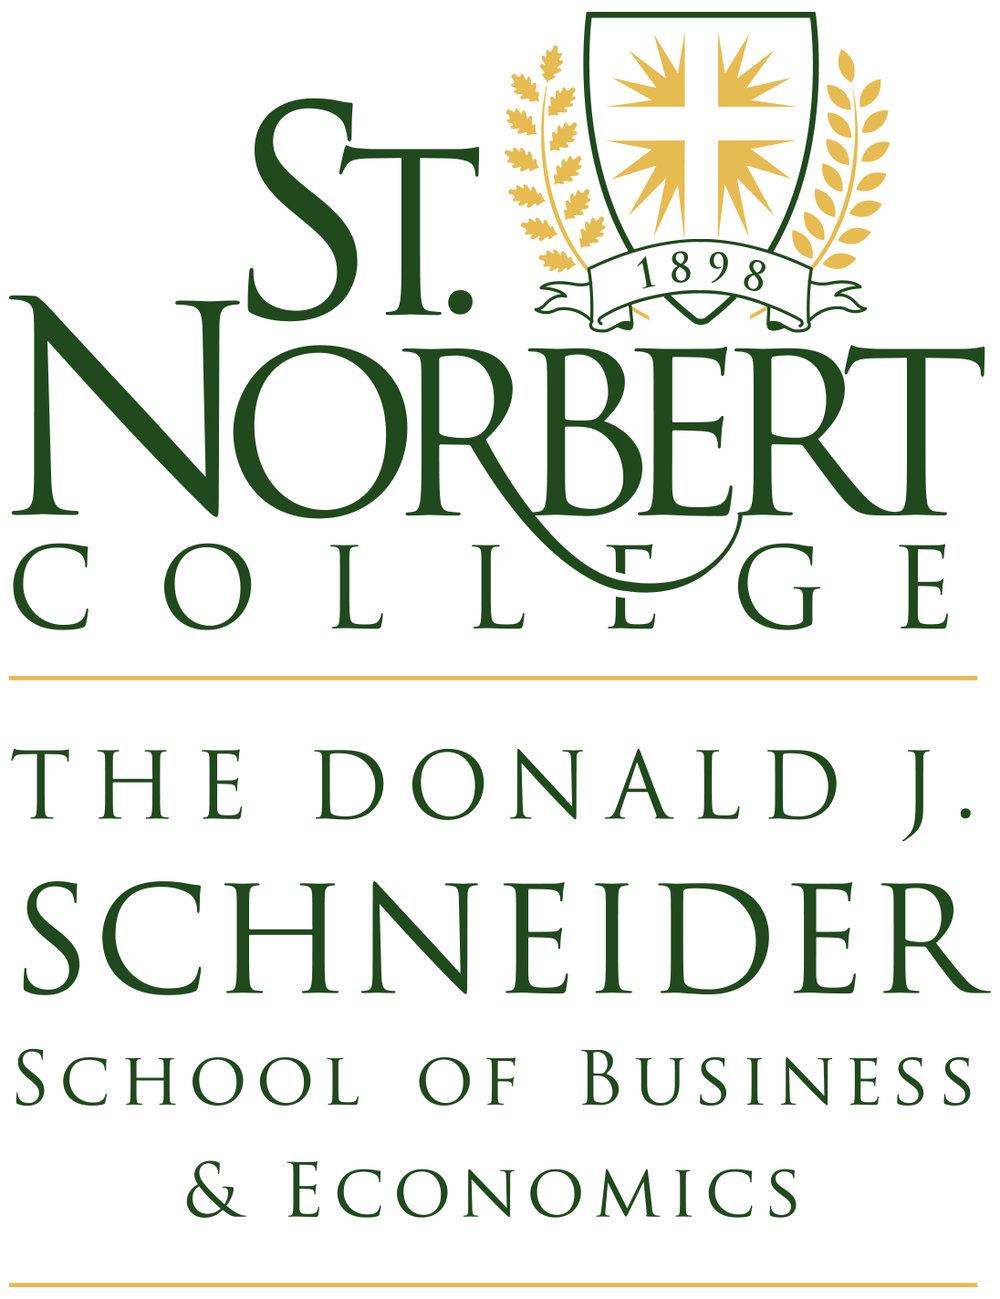 StNorbertSchneiderSchool-2color.jpg